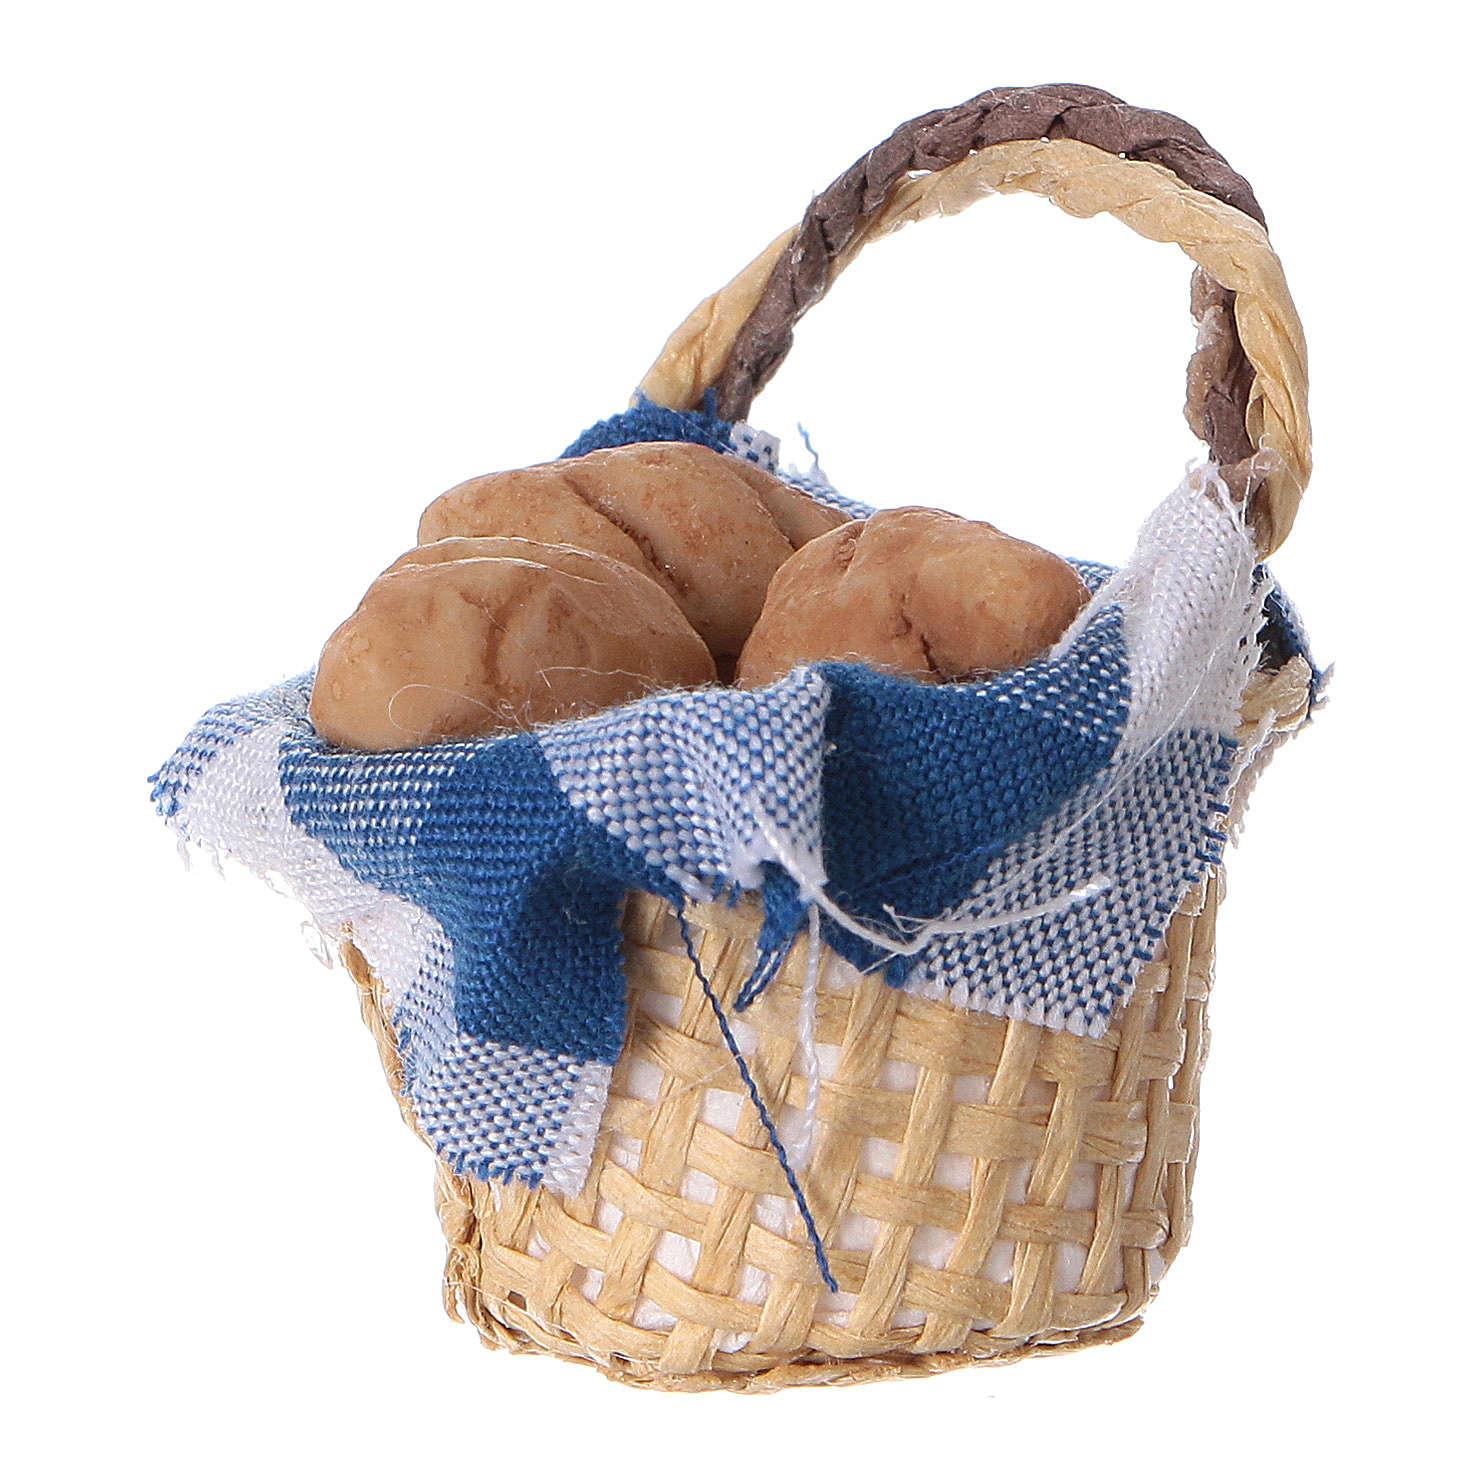 Cesta con pan para belén hecho con bricolaje h real 4 cm 4